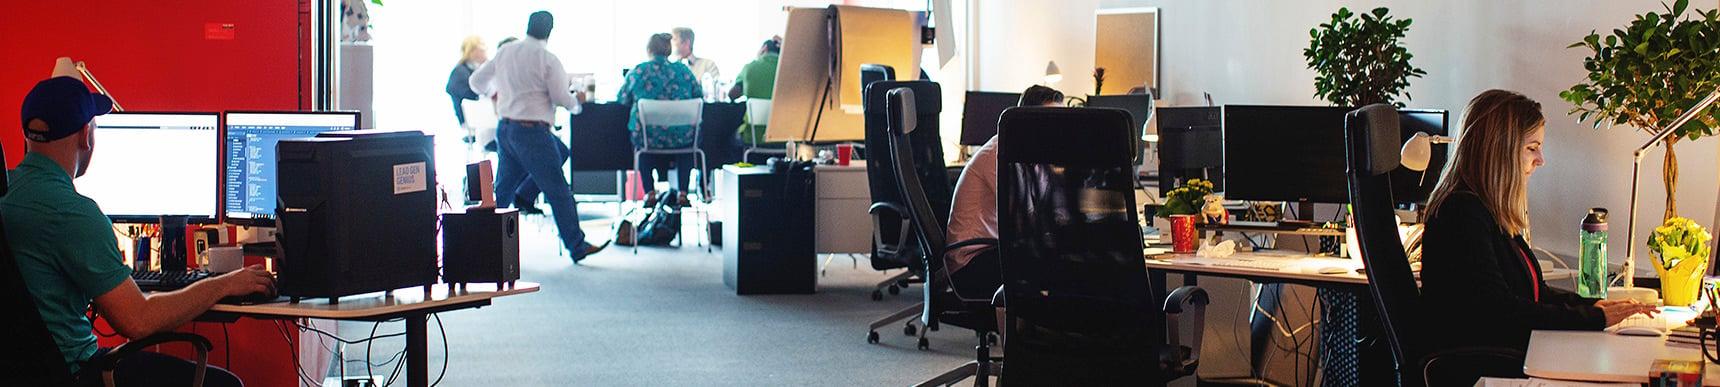 The Brit Agency In Action - Toronto HubSpot Partner